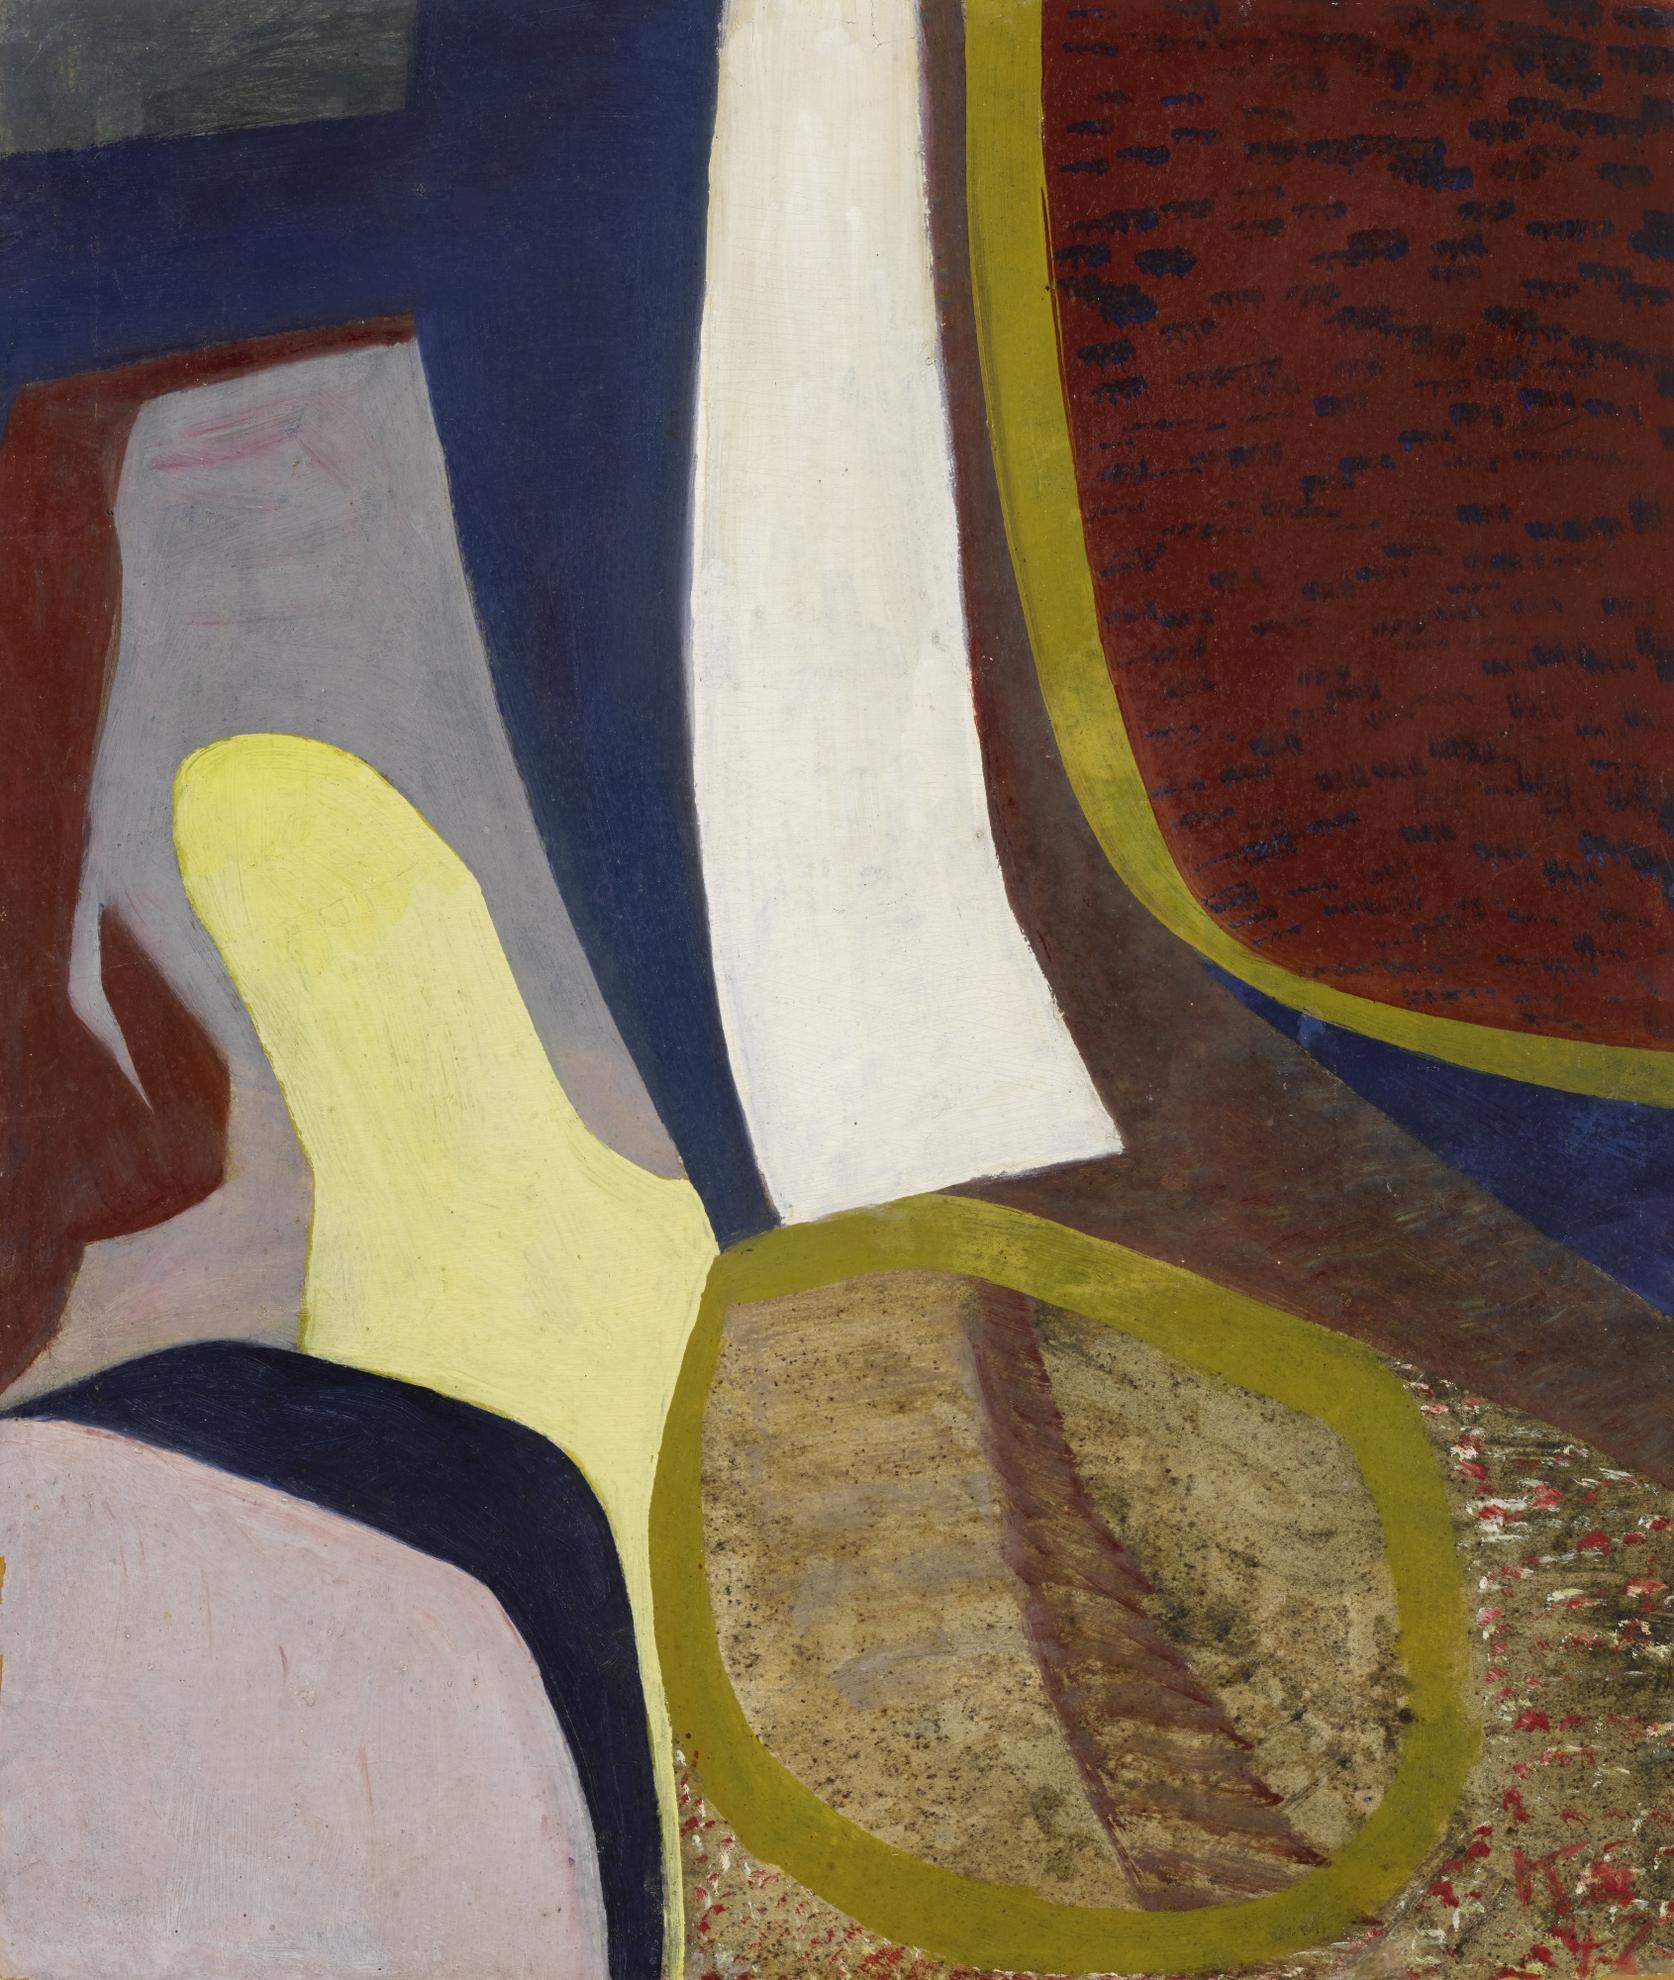 Kurt Schwitters-Ohne Titel (Abstraktes Bild Mit Ockerfarbenem Kreis) (Untitled (Abstract Painting With Ochre Circle))-1947